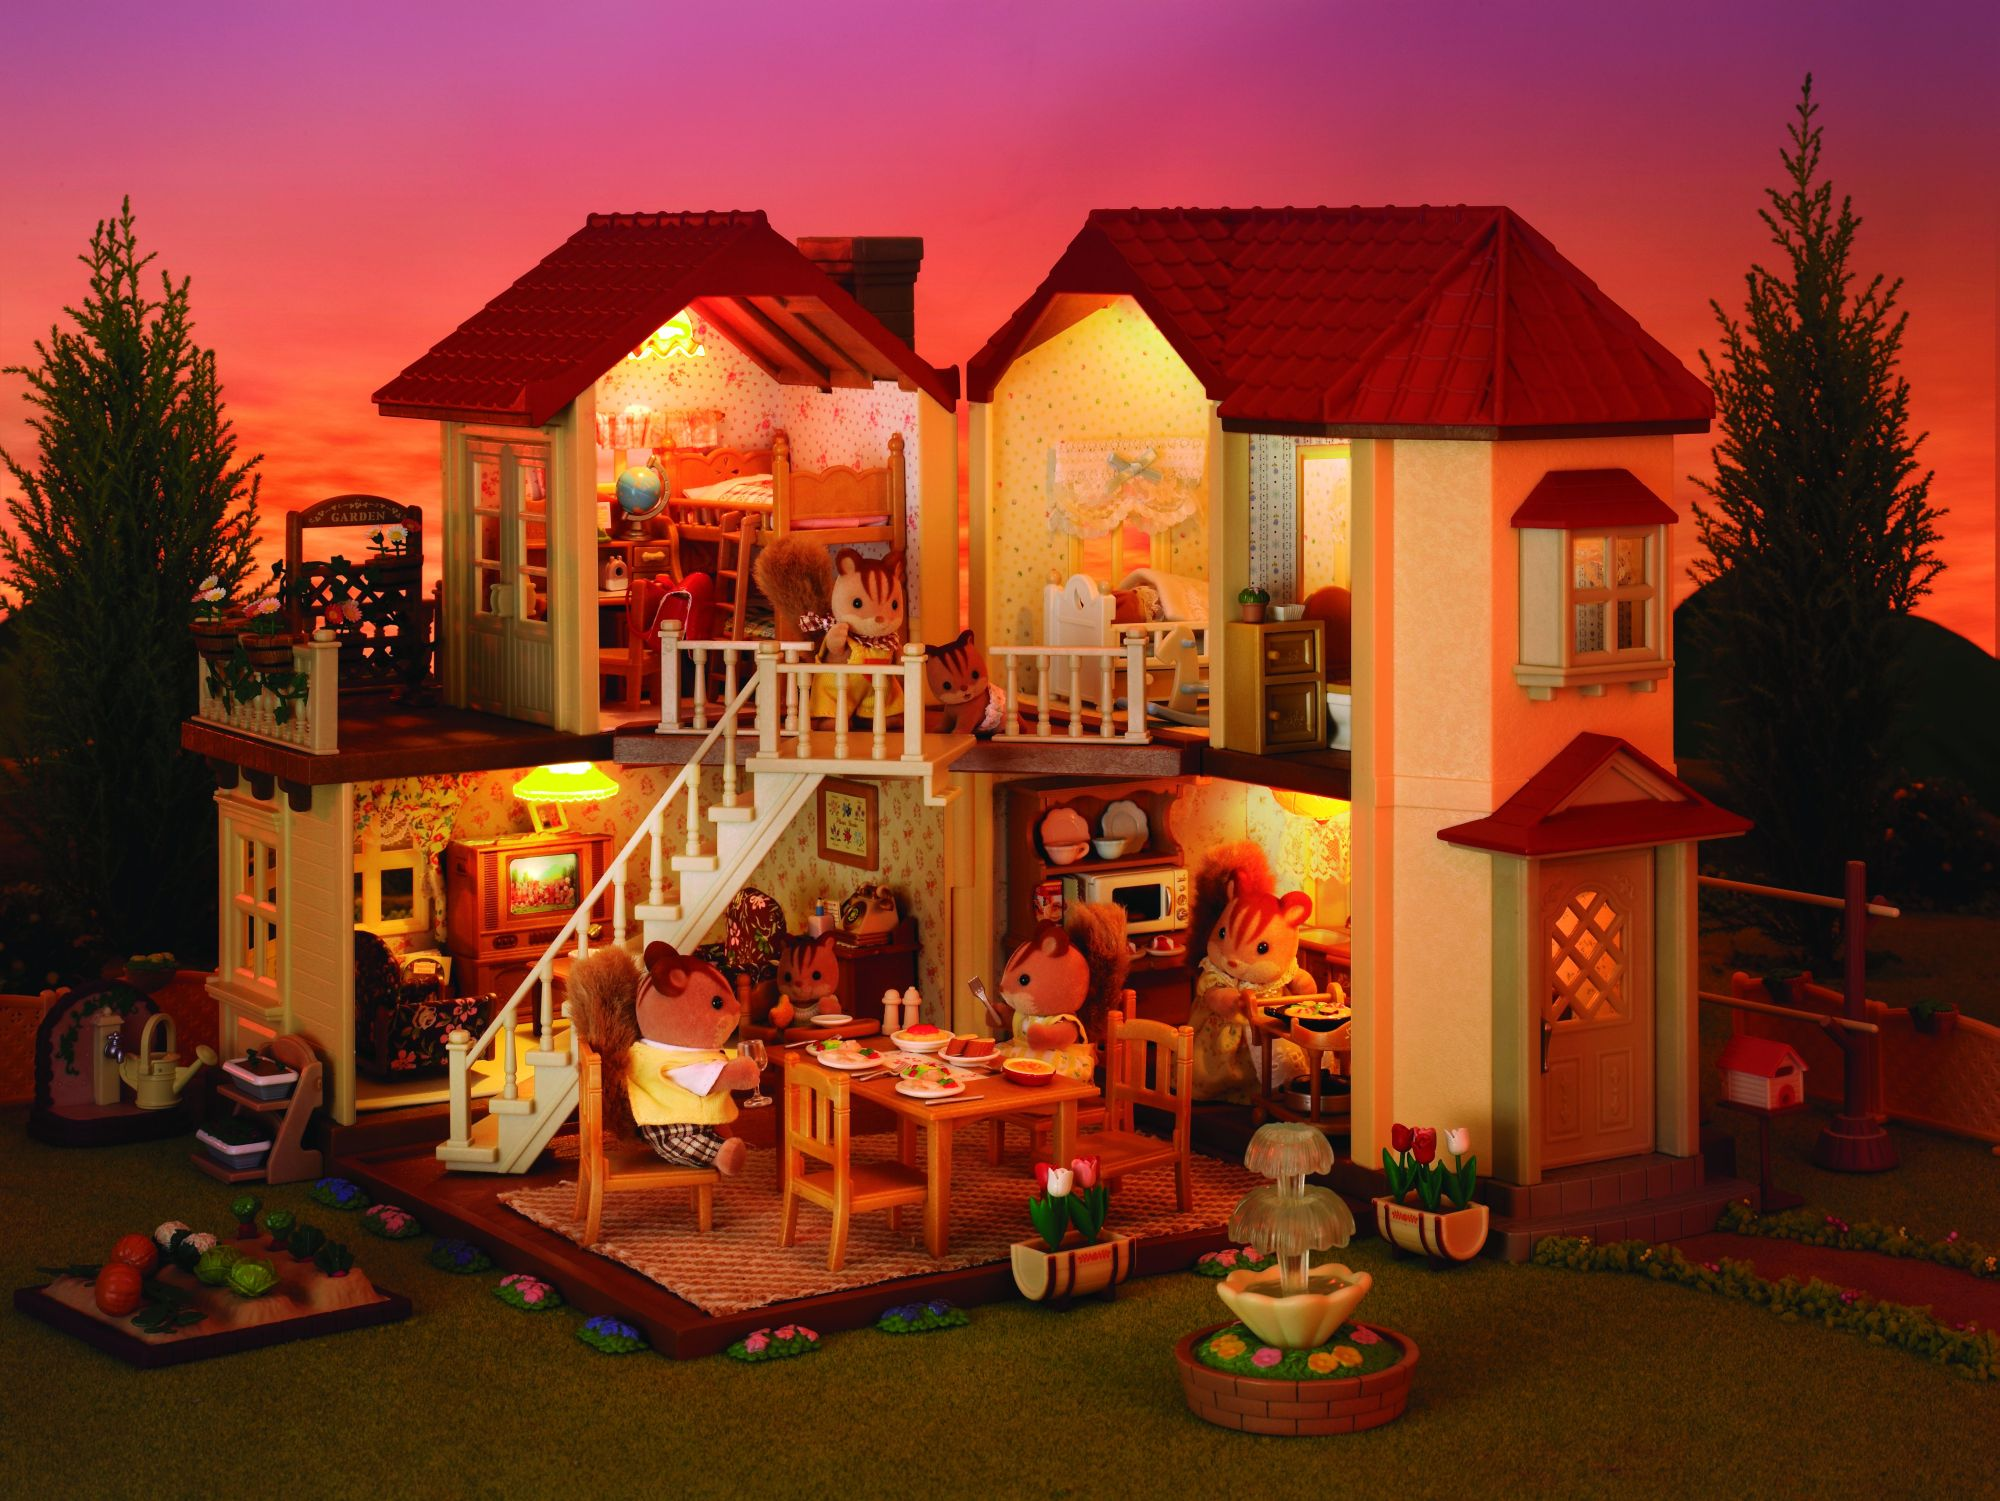 sylvanian grande maison tradition de sylvanian. Black Bedroom Furniture Sets. Home Design Ideas